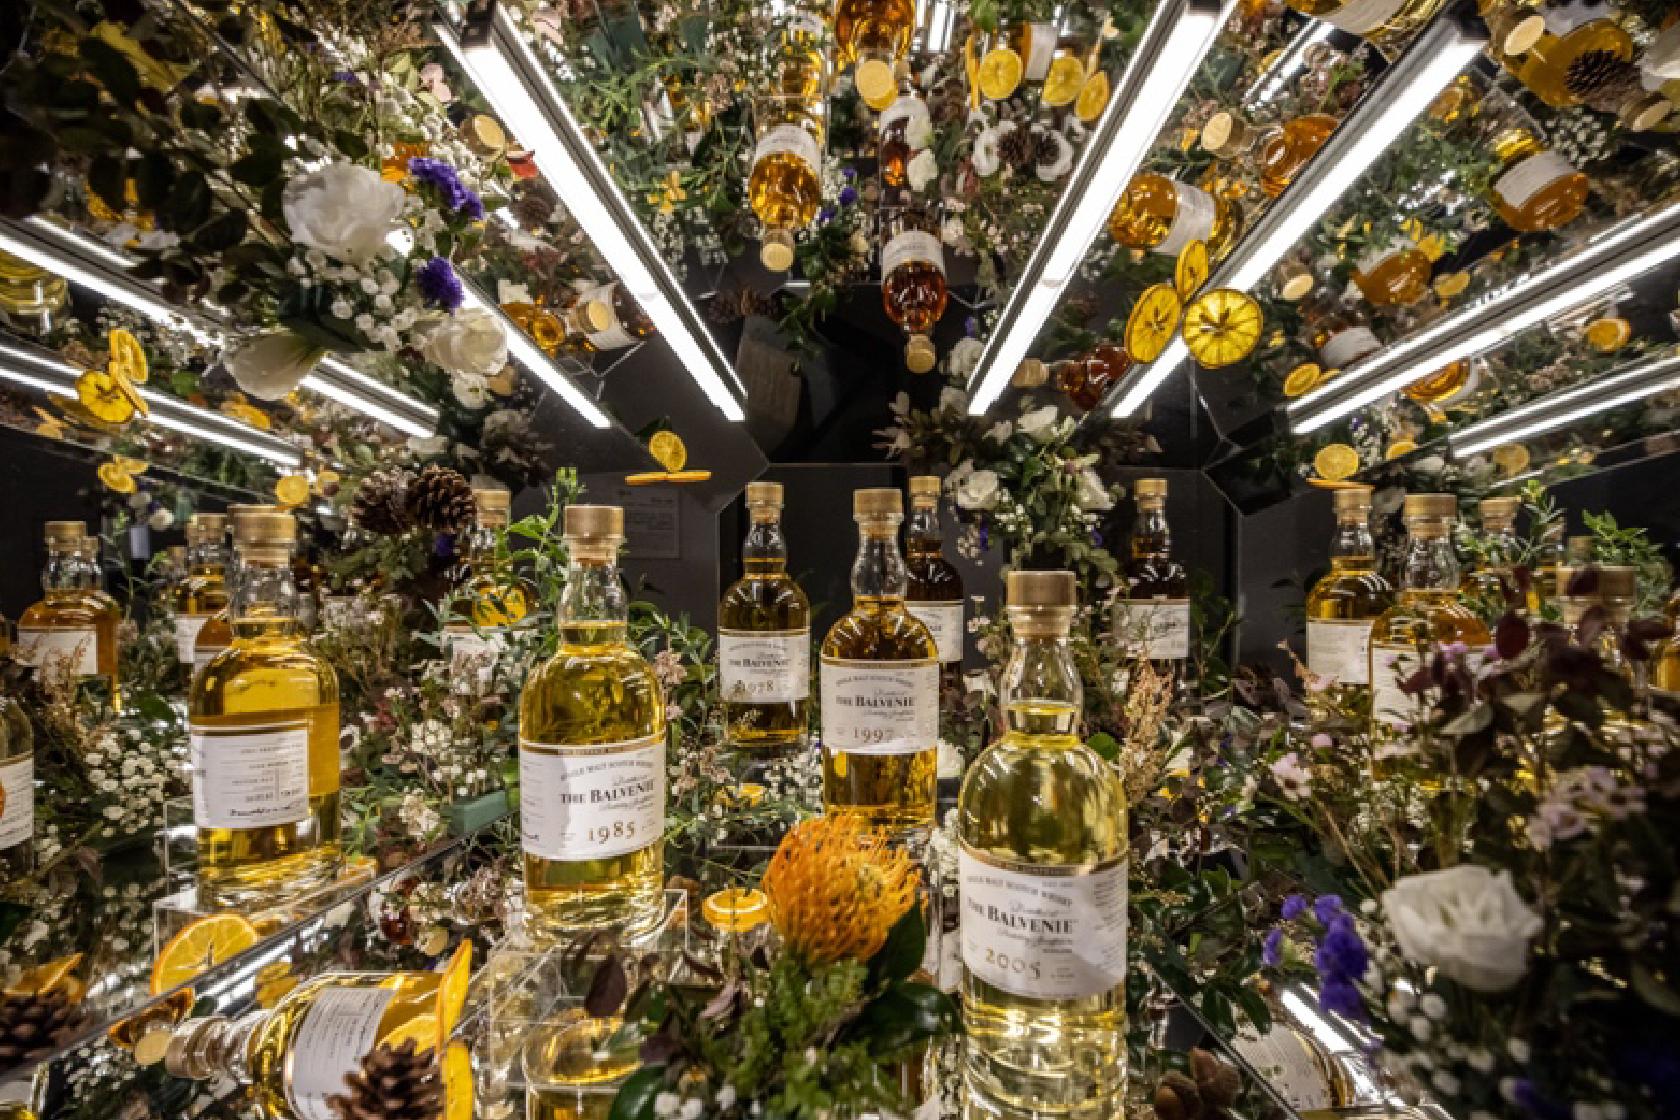 WE CHEERS|首席調酒師系列,百富展出25支珍稀原酒